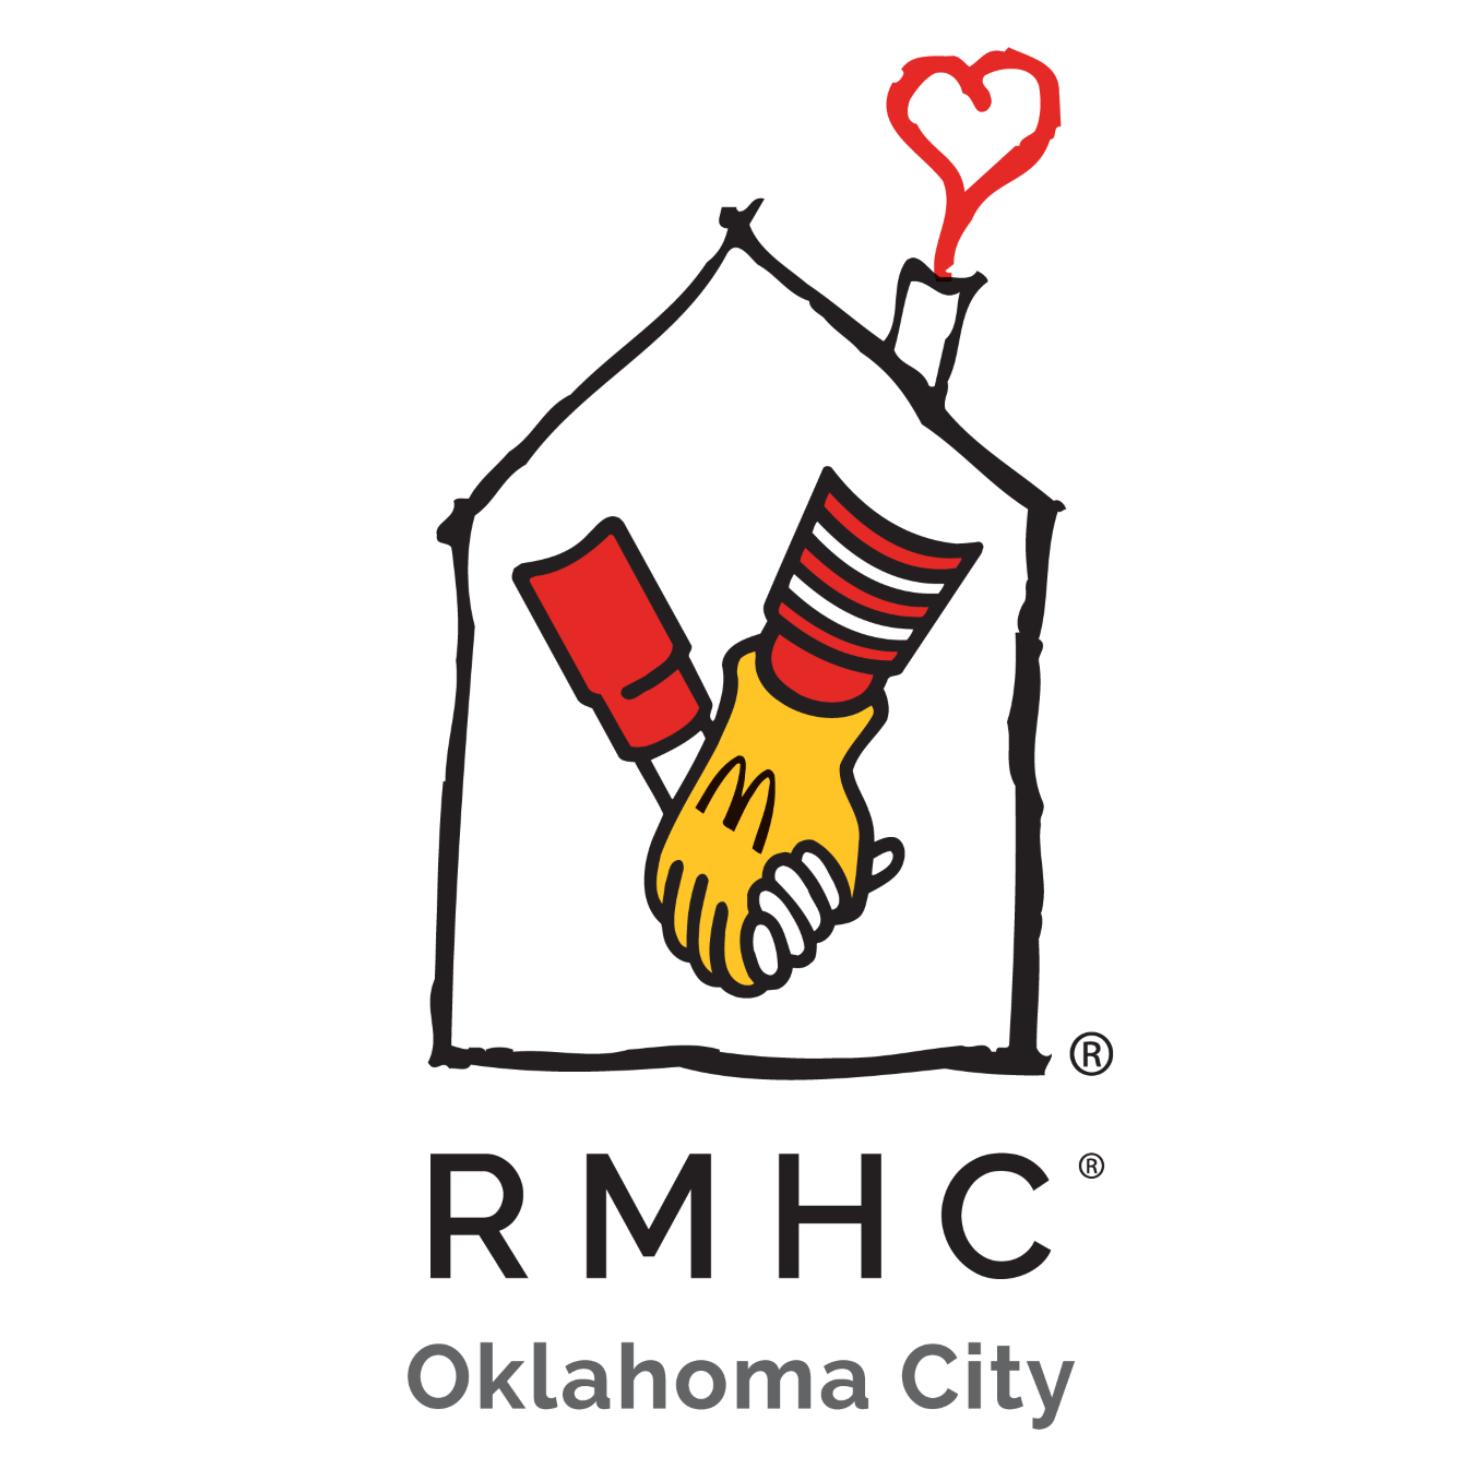 Ronald McDonald House Charities of OKC